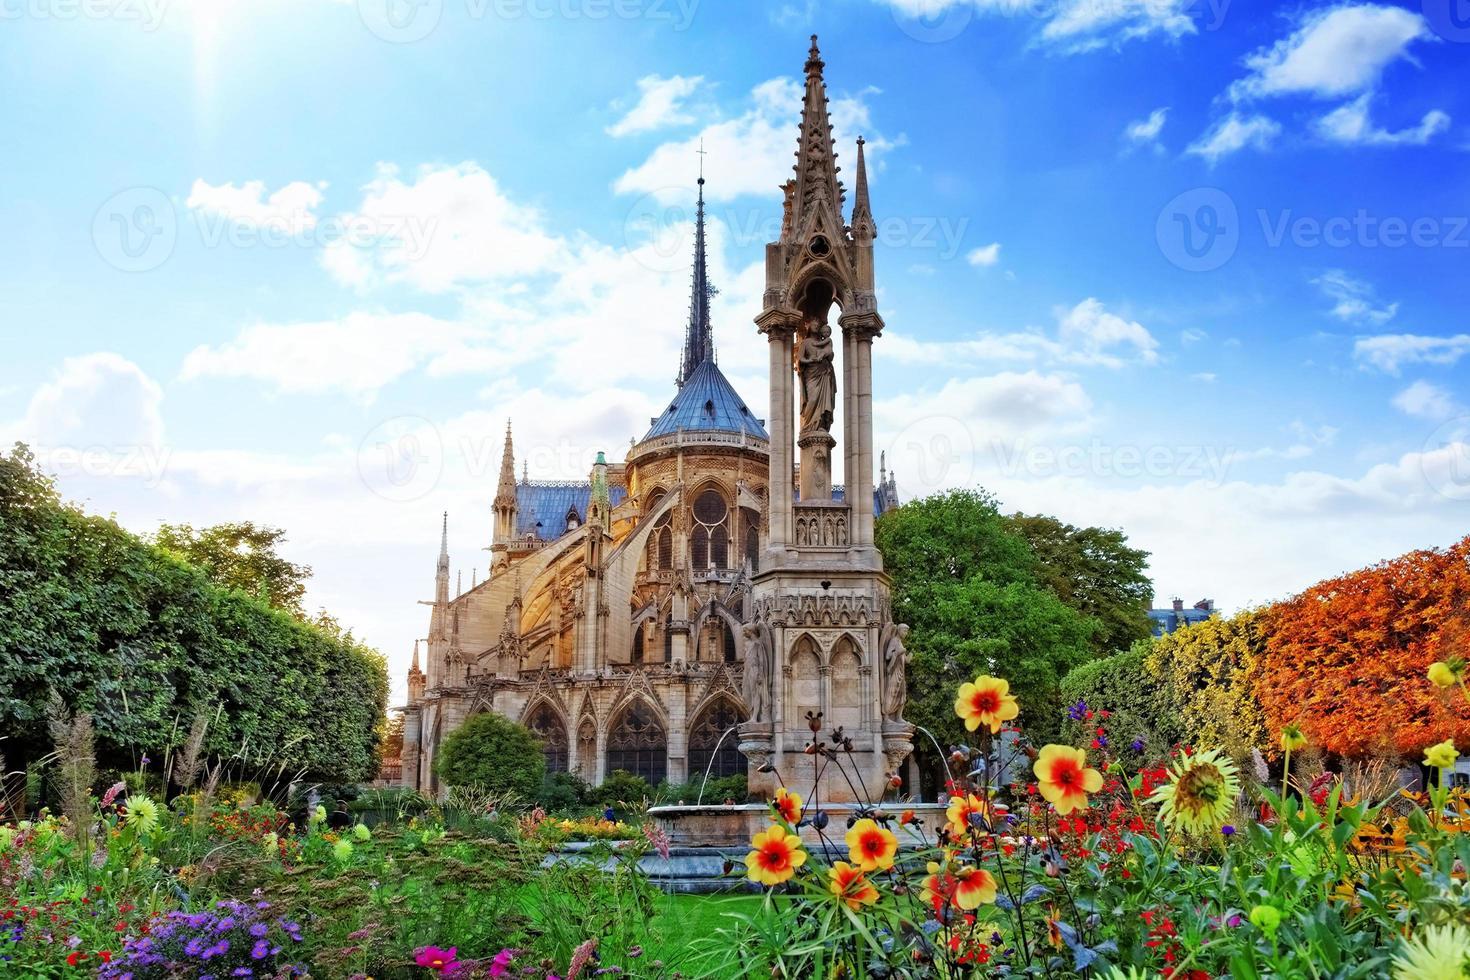 notre dame de paris katedral, trädgård med blommor. paris. Frankrike foto